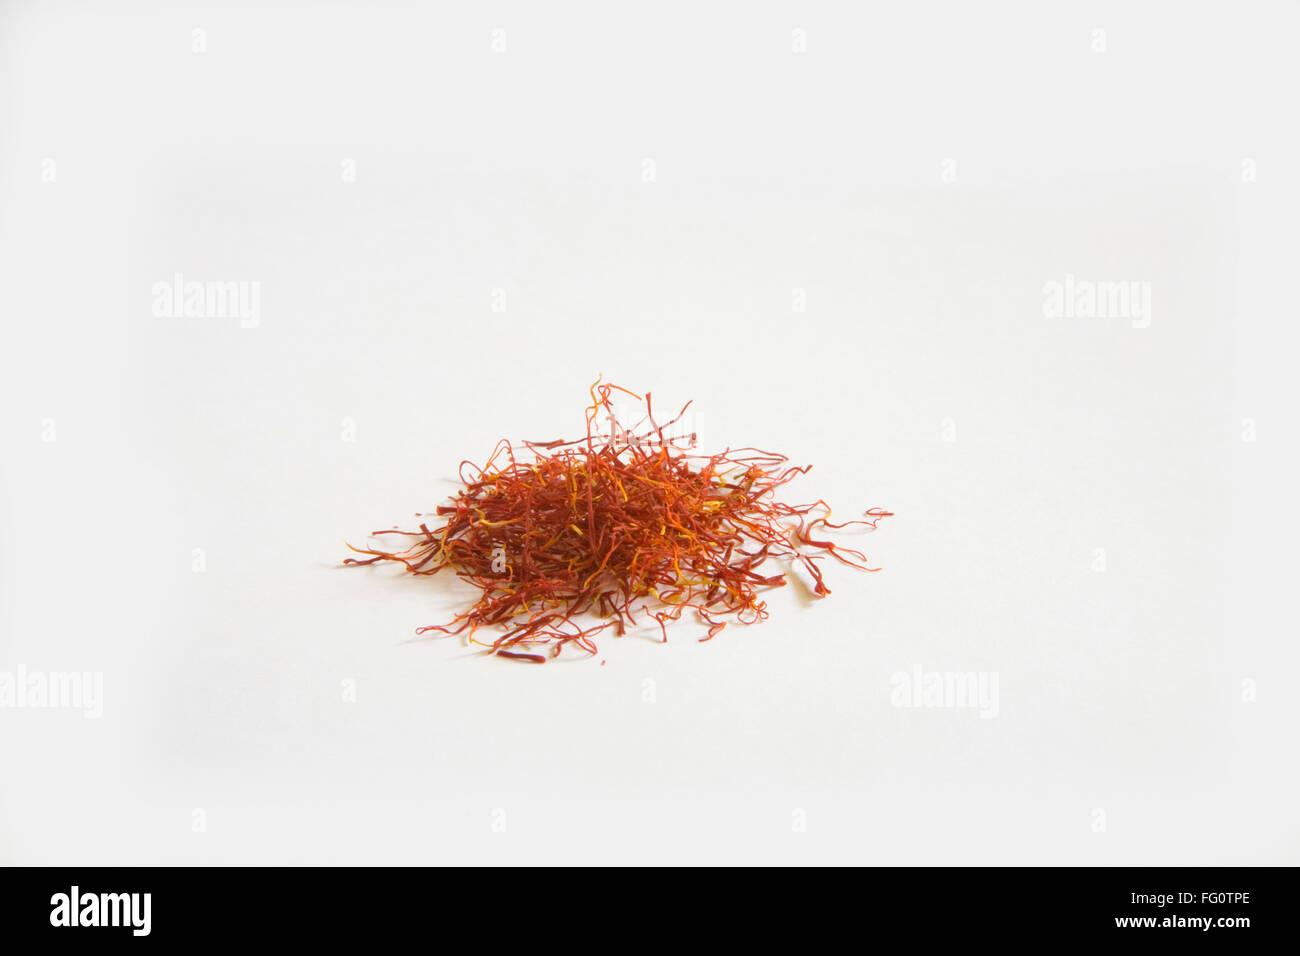 Indian spice , Saffron Kesar Crocus sativus on white background - Stock Image